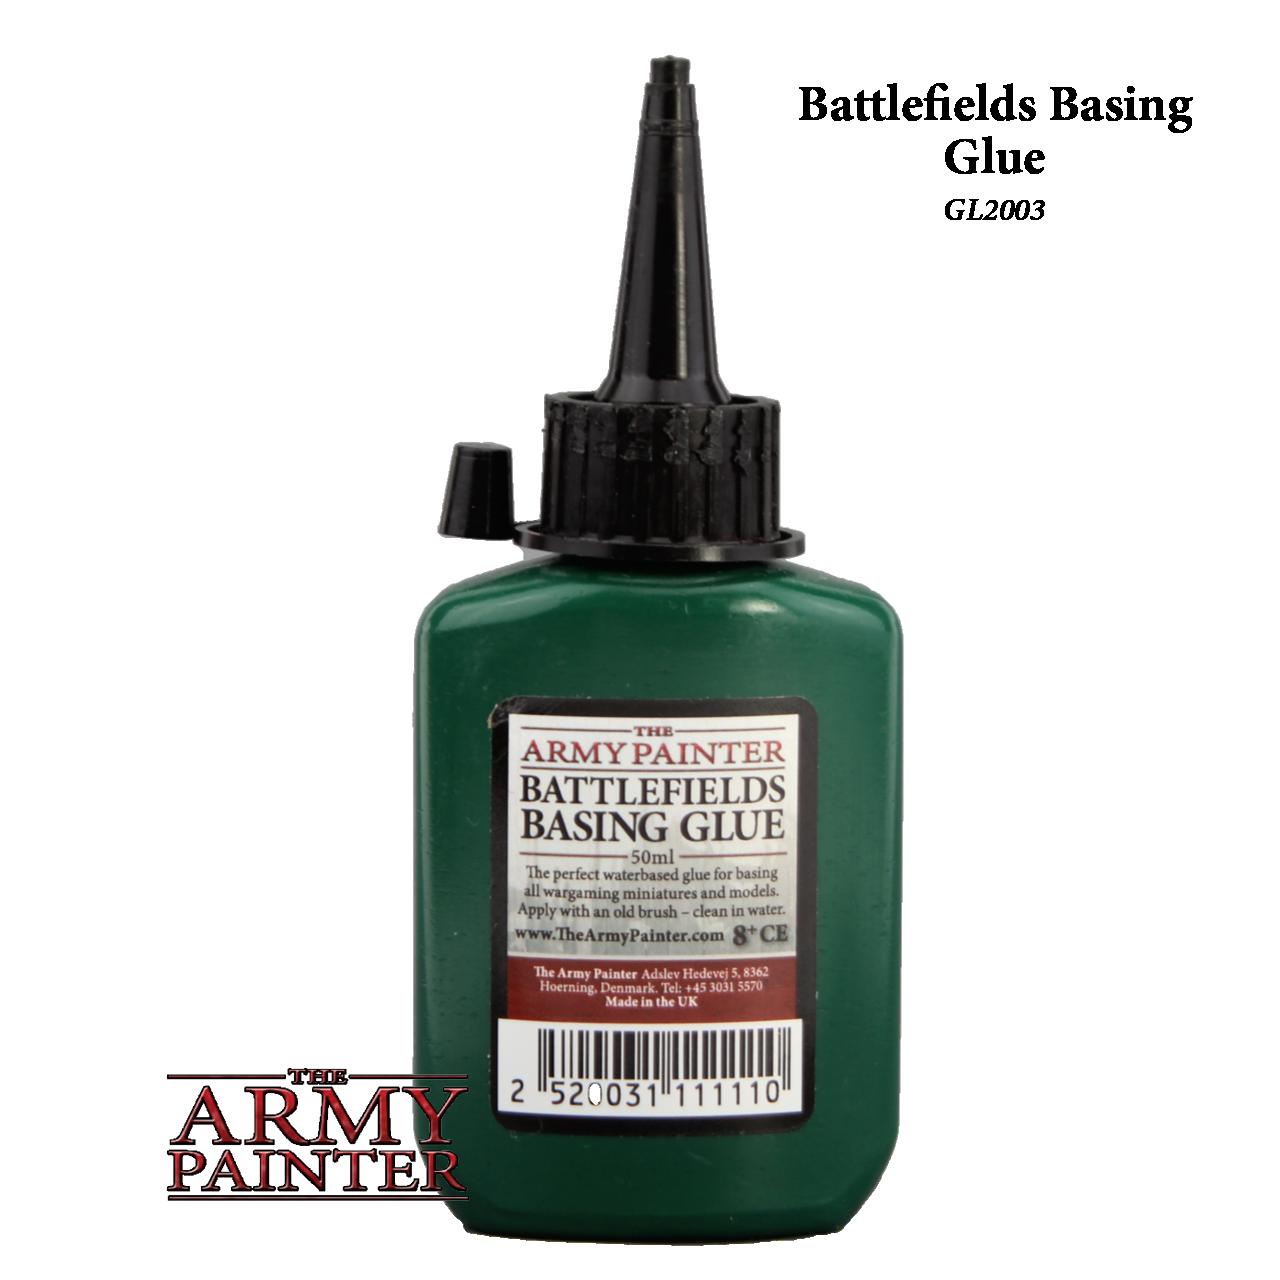 Battlefields Basing Glue (PVA) 50ml - Leim - Army Painter AP-GL2003